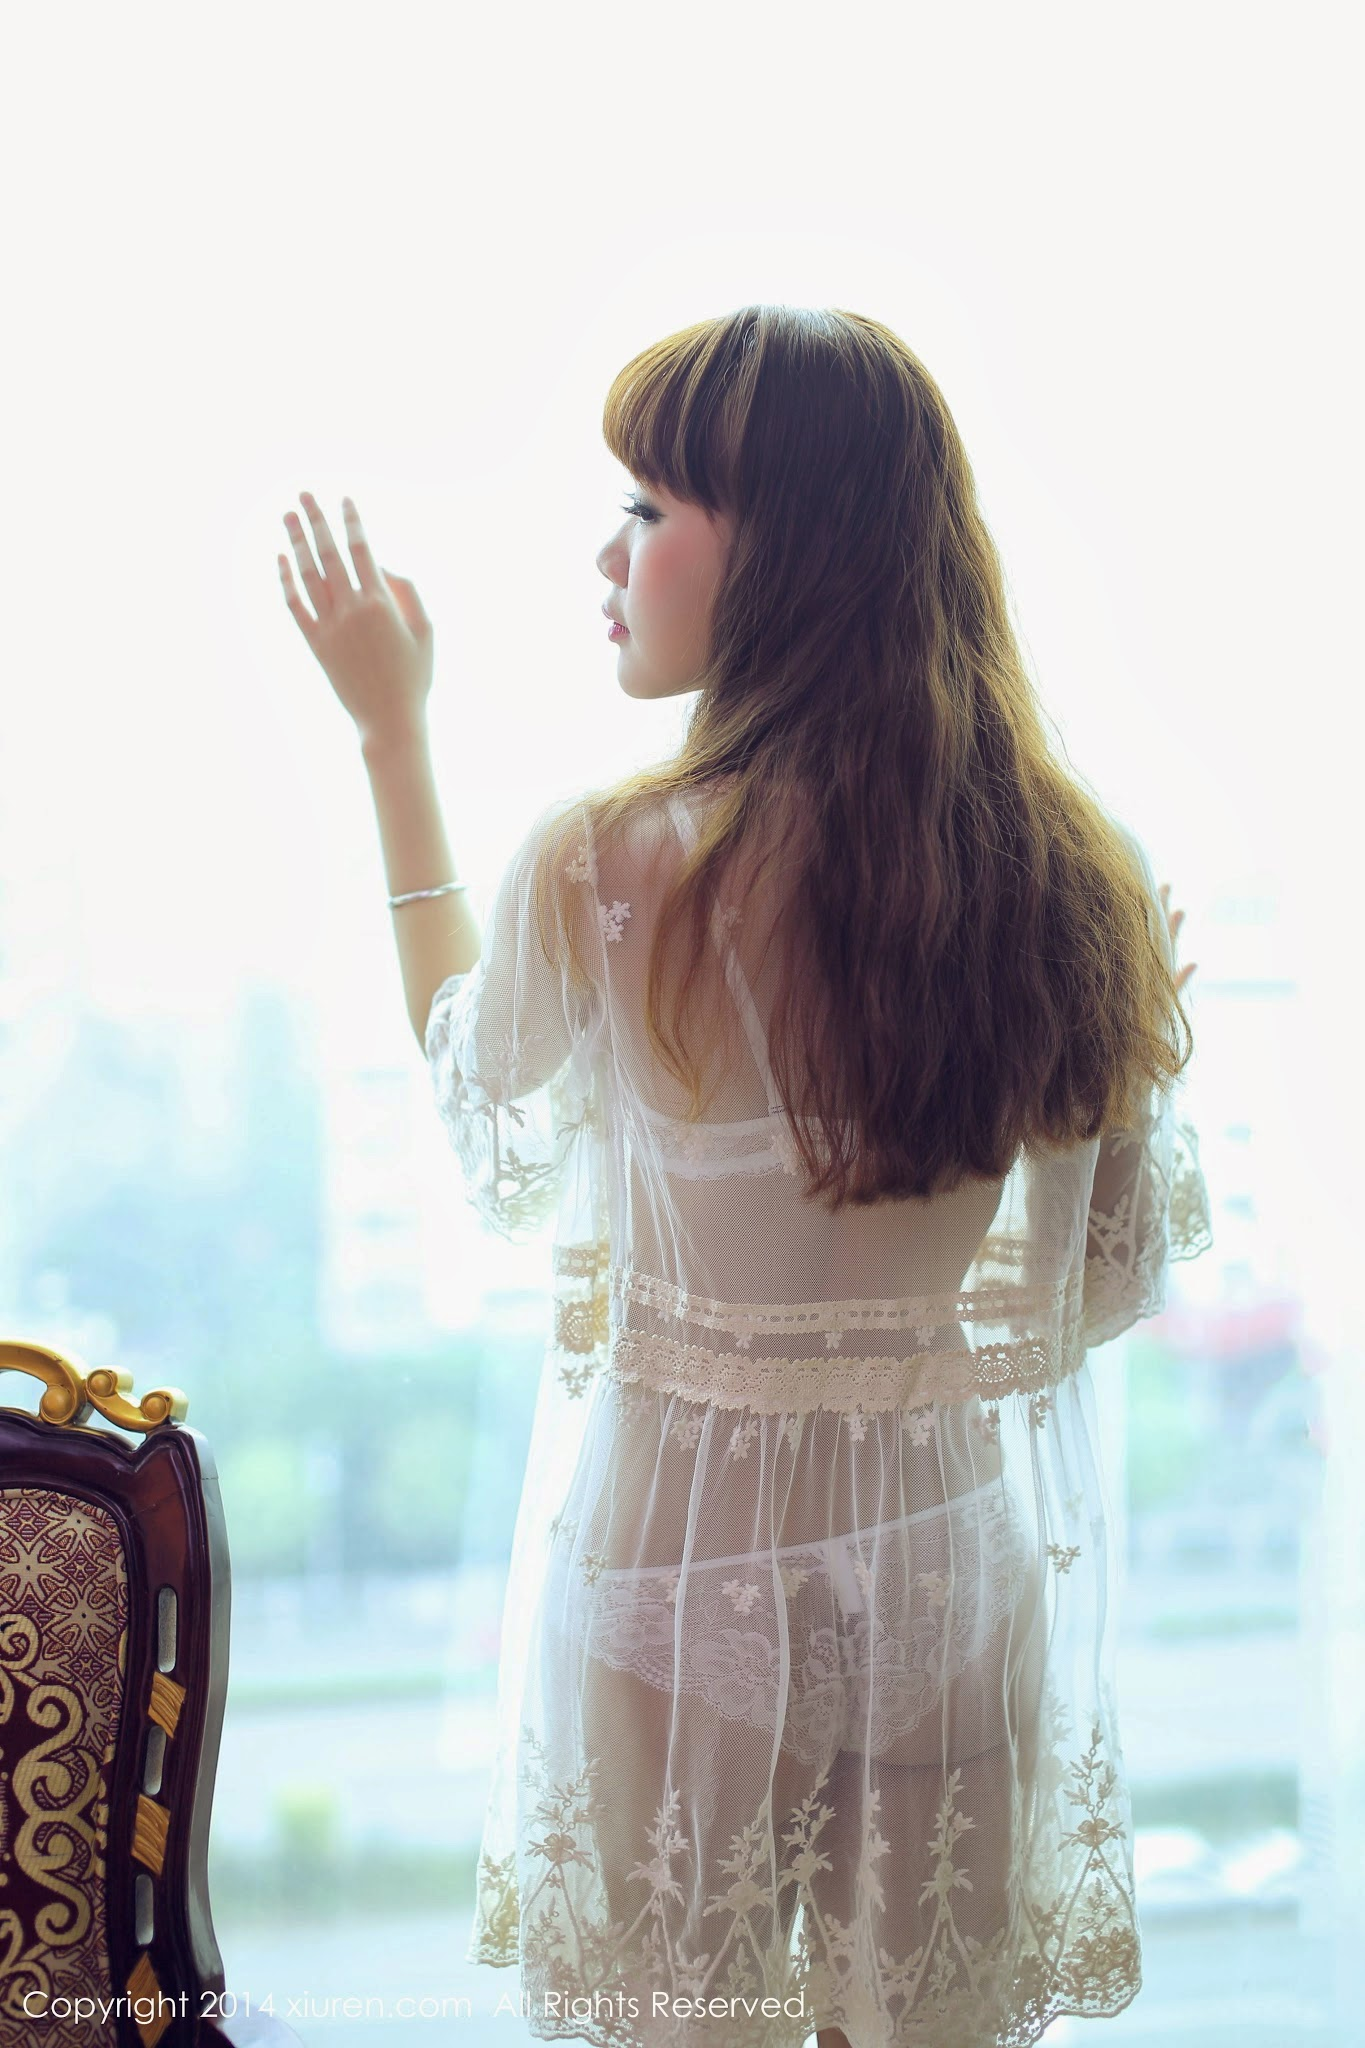 XiuRen 优琪琪子yuki | See Through Lingerie |[秀人网美媛馆]2014.03.15 ...